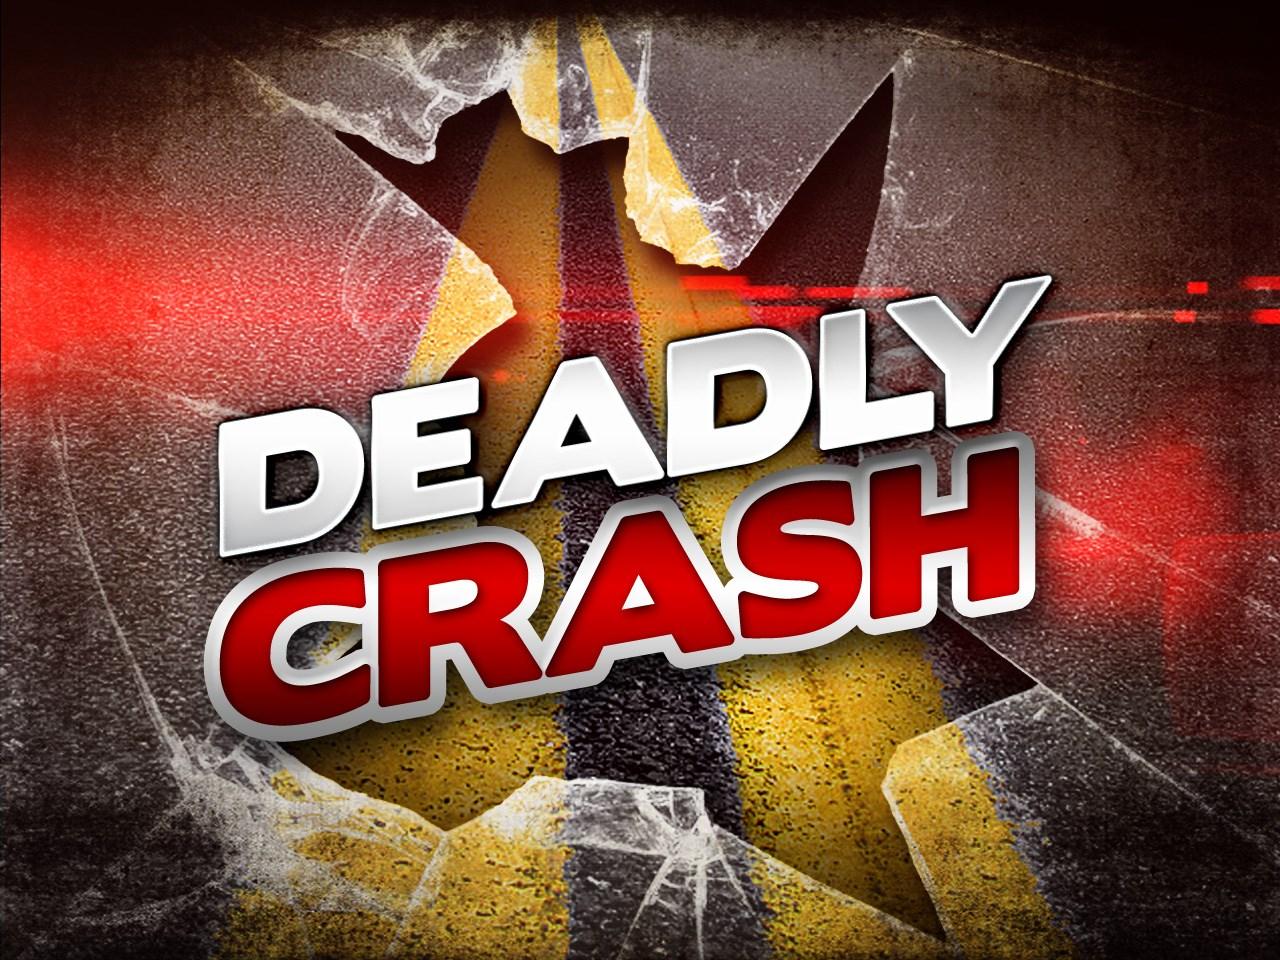 deadly crash fatal accident